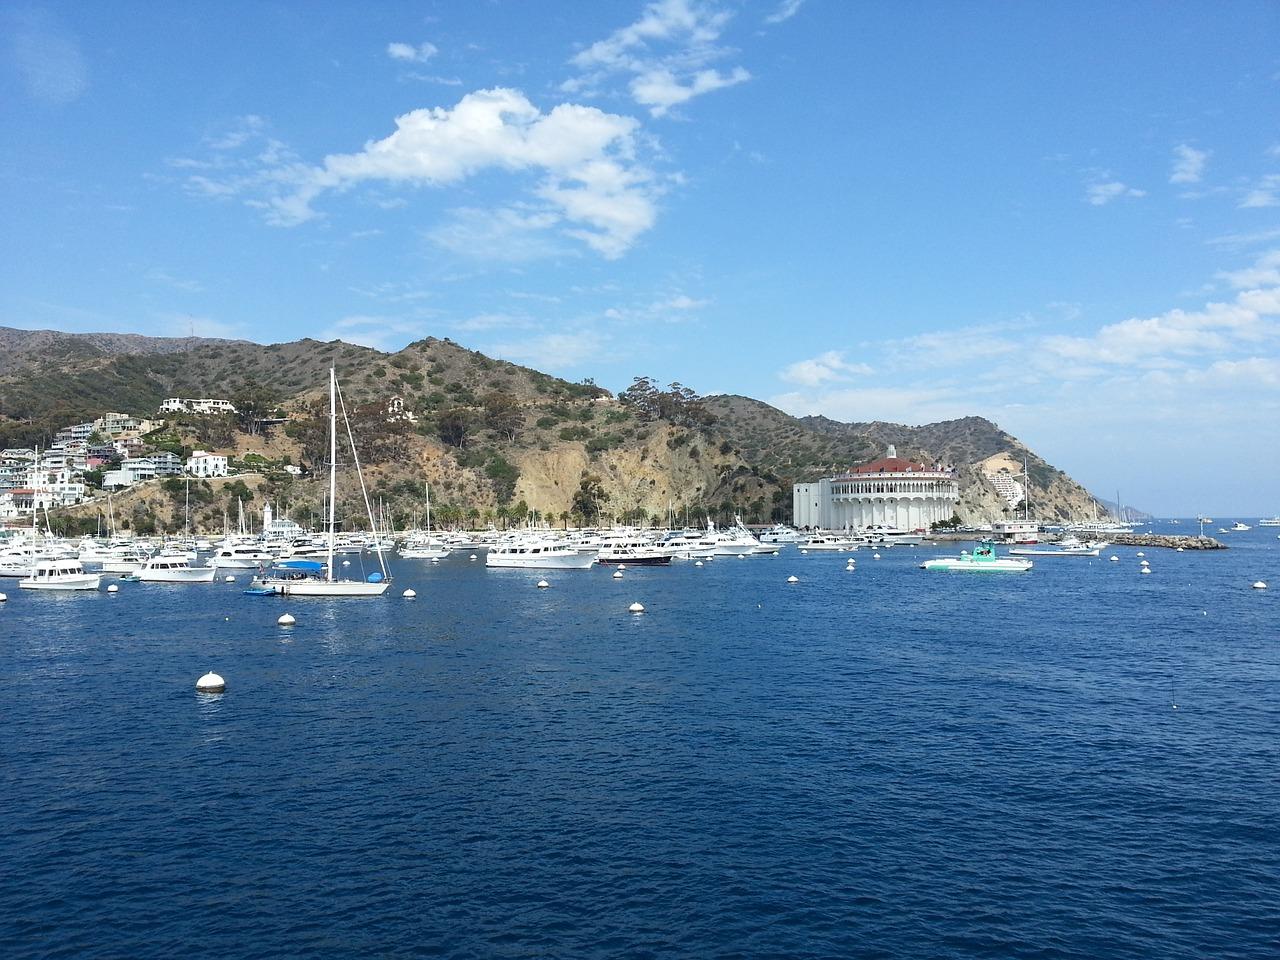 catalina-island-boats, ocean